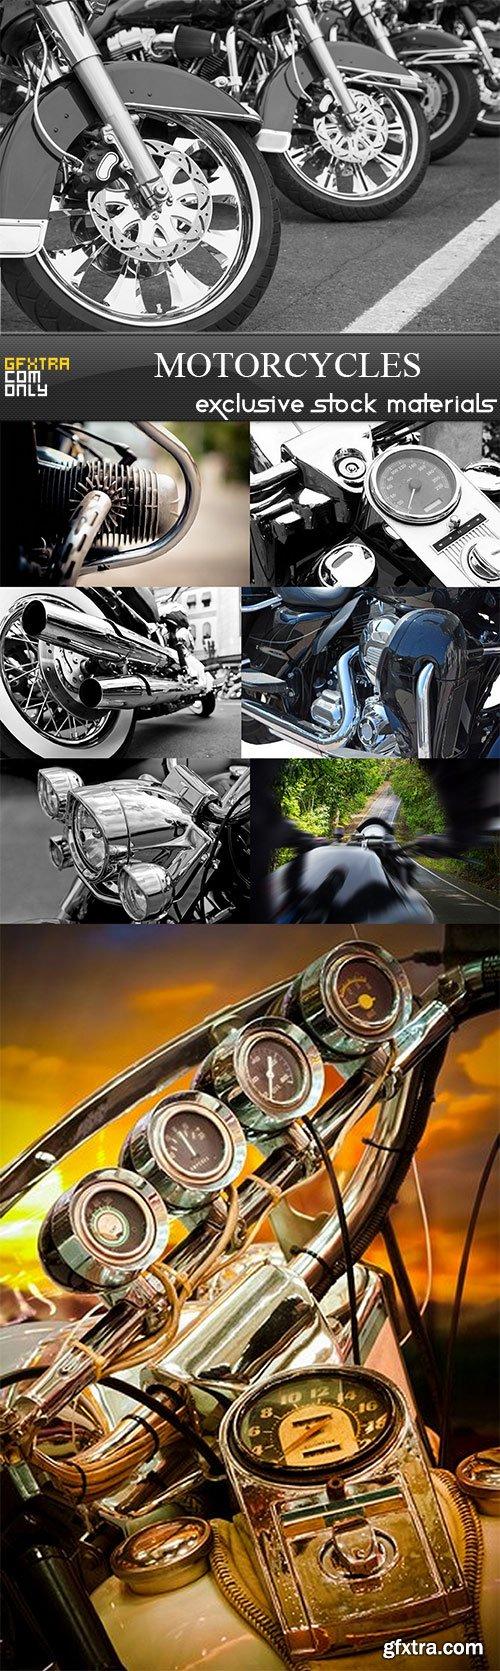 Motorcycles - 8 UHQ JPEG